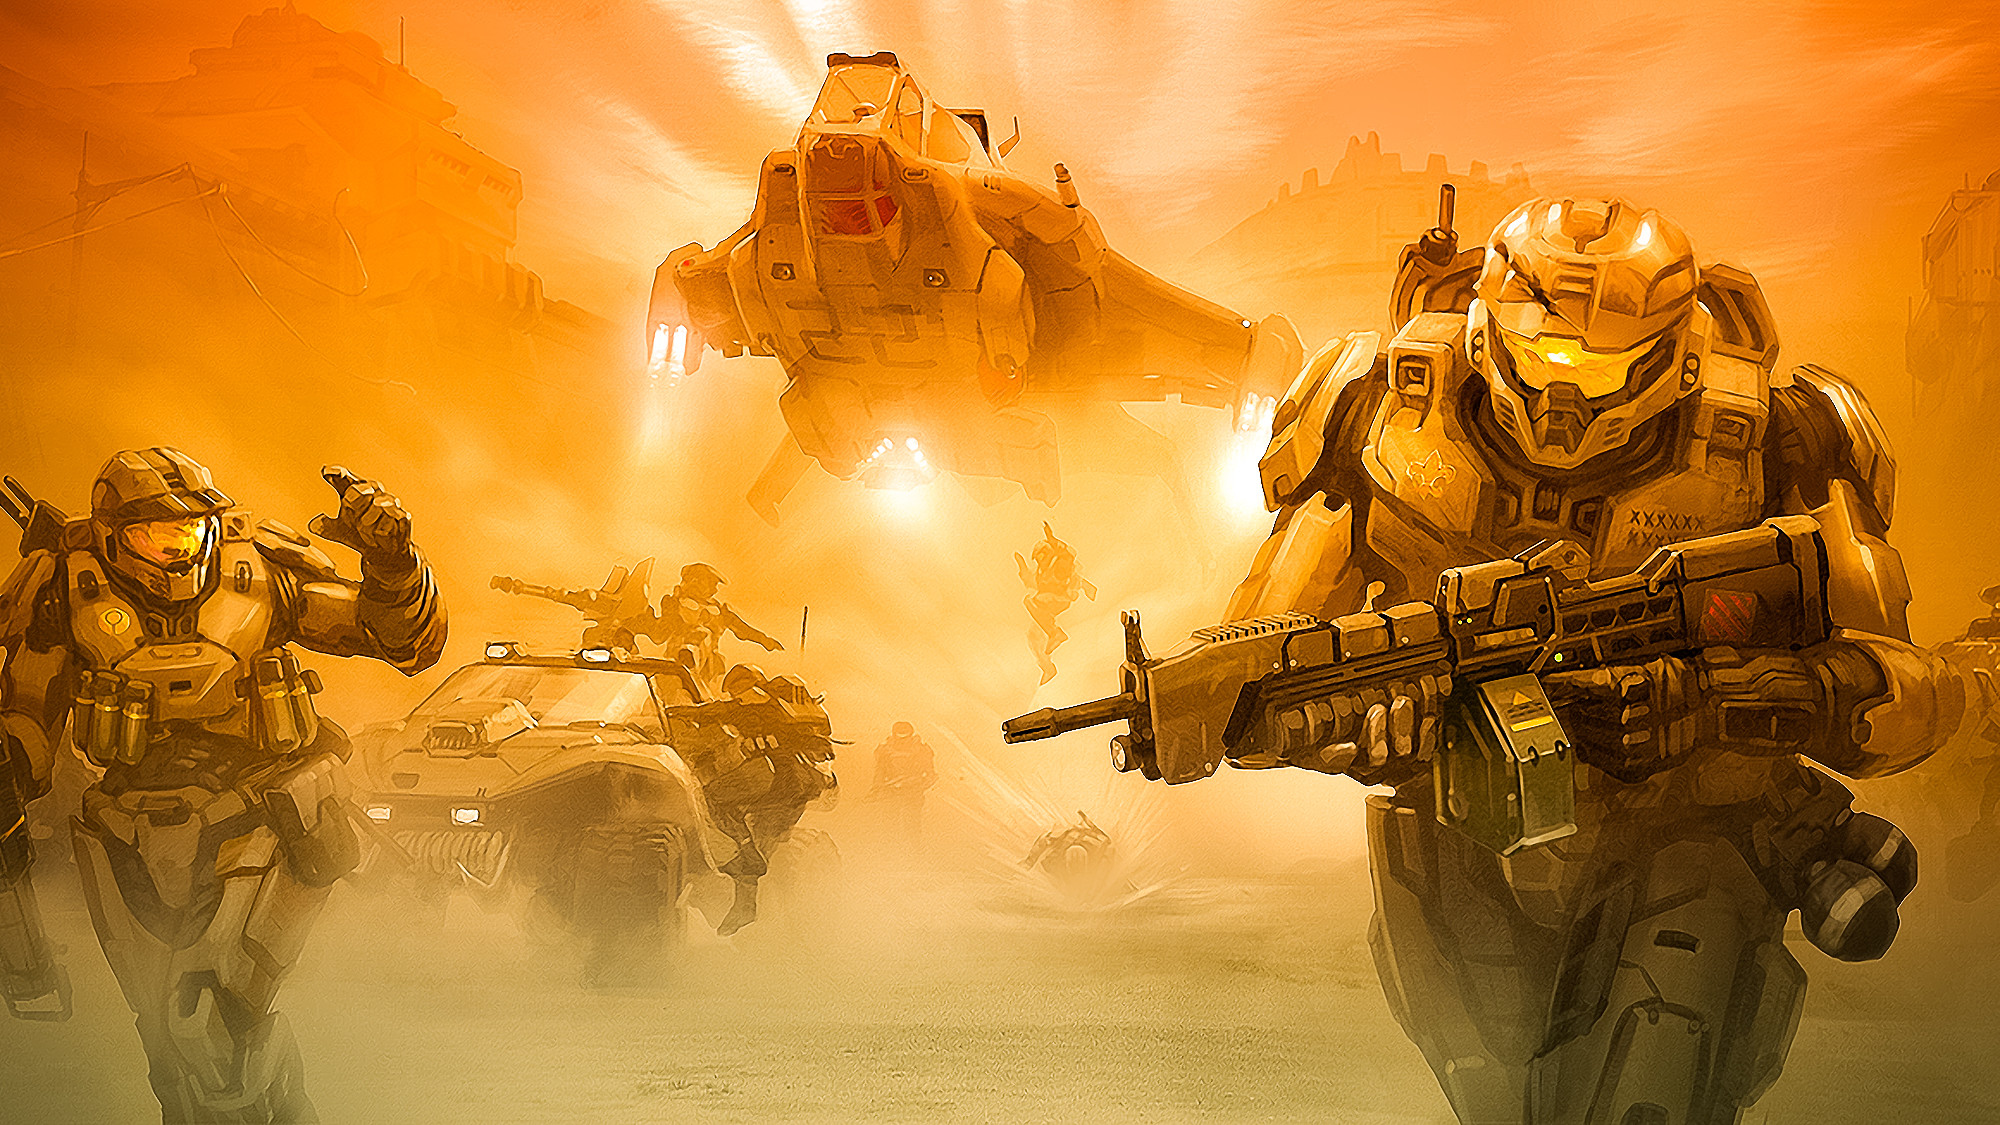 Game Halo 5 Wallpaper HD